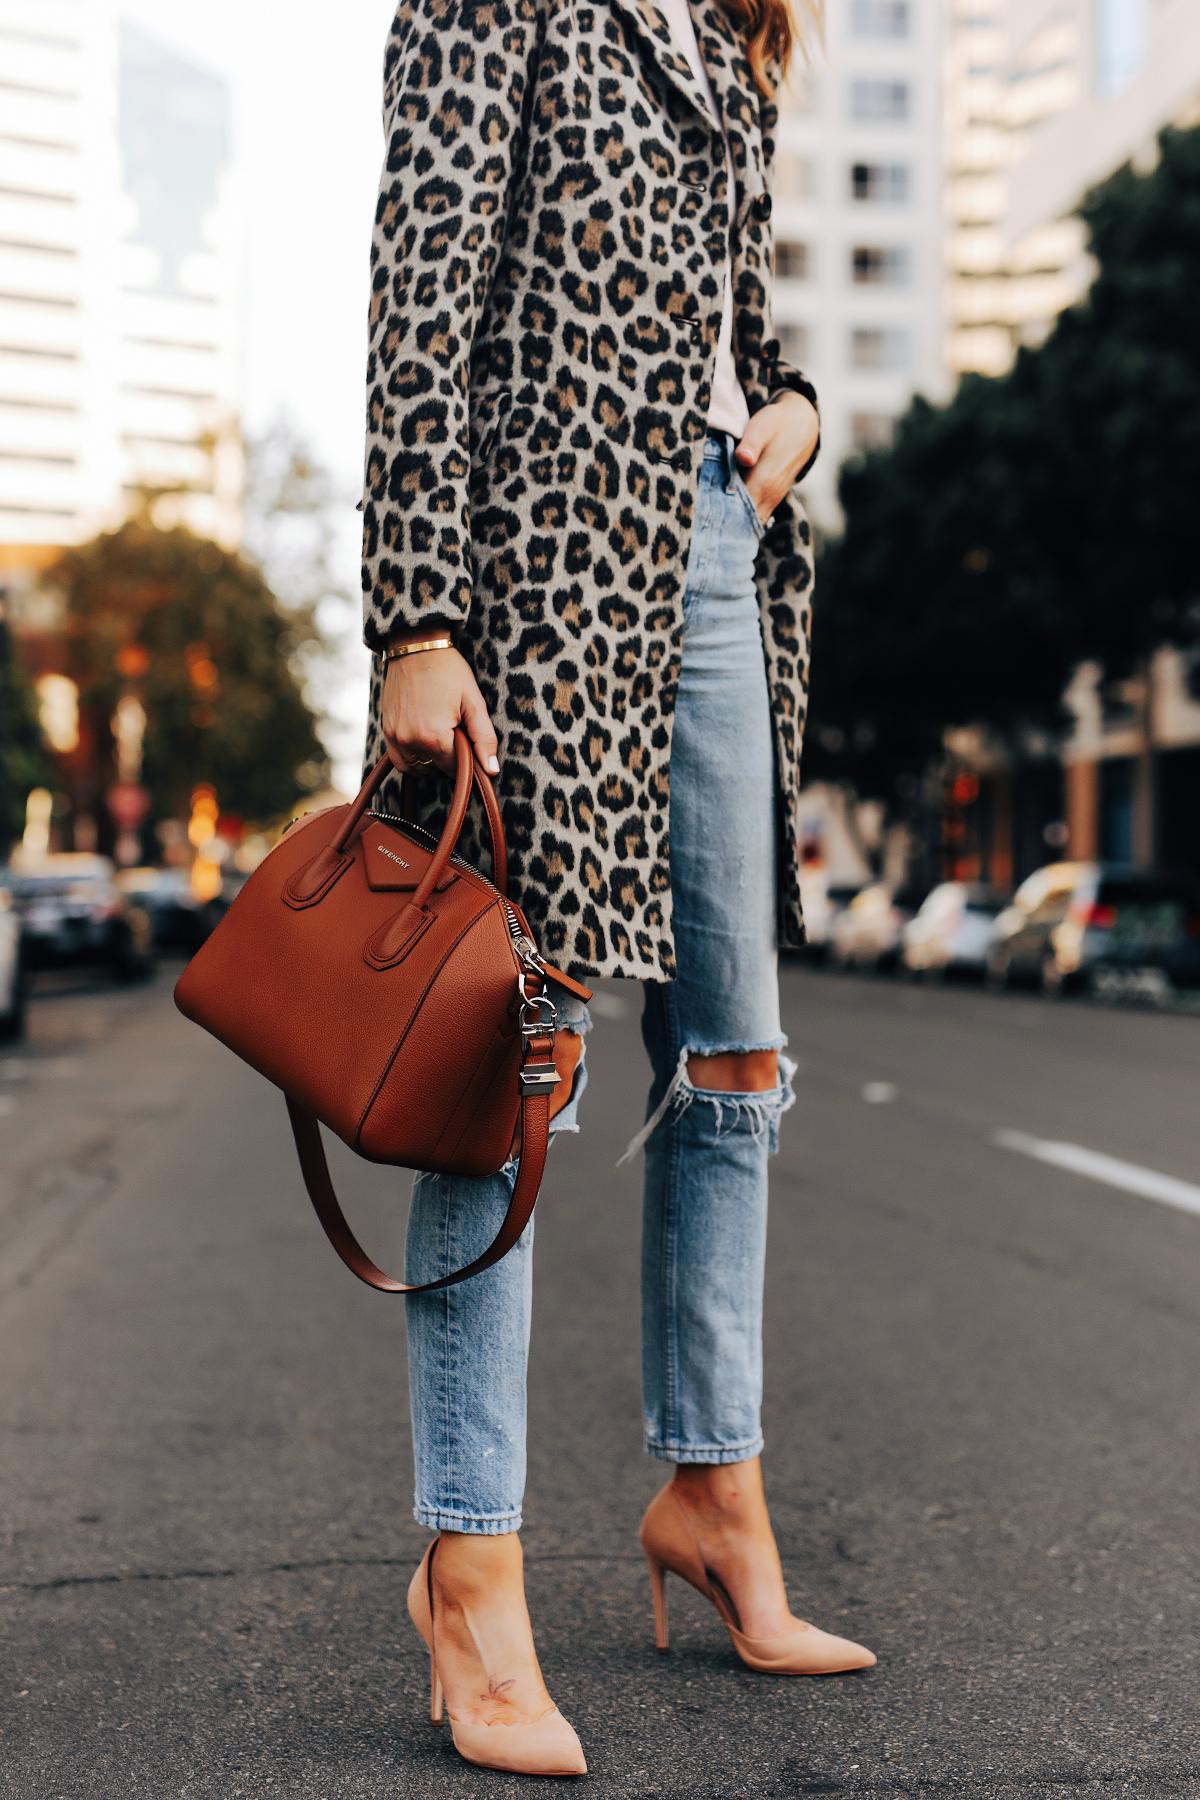 Fashion Jackson Wearing Ann Taylor Leopard Coat Ripped Jeans Nude Pumps Givenchy Antigona Cognac Satchel